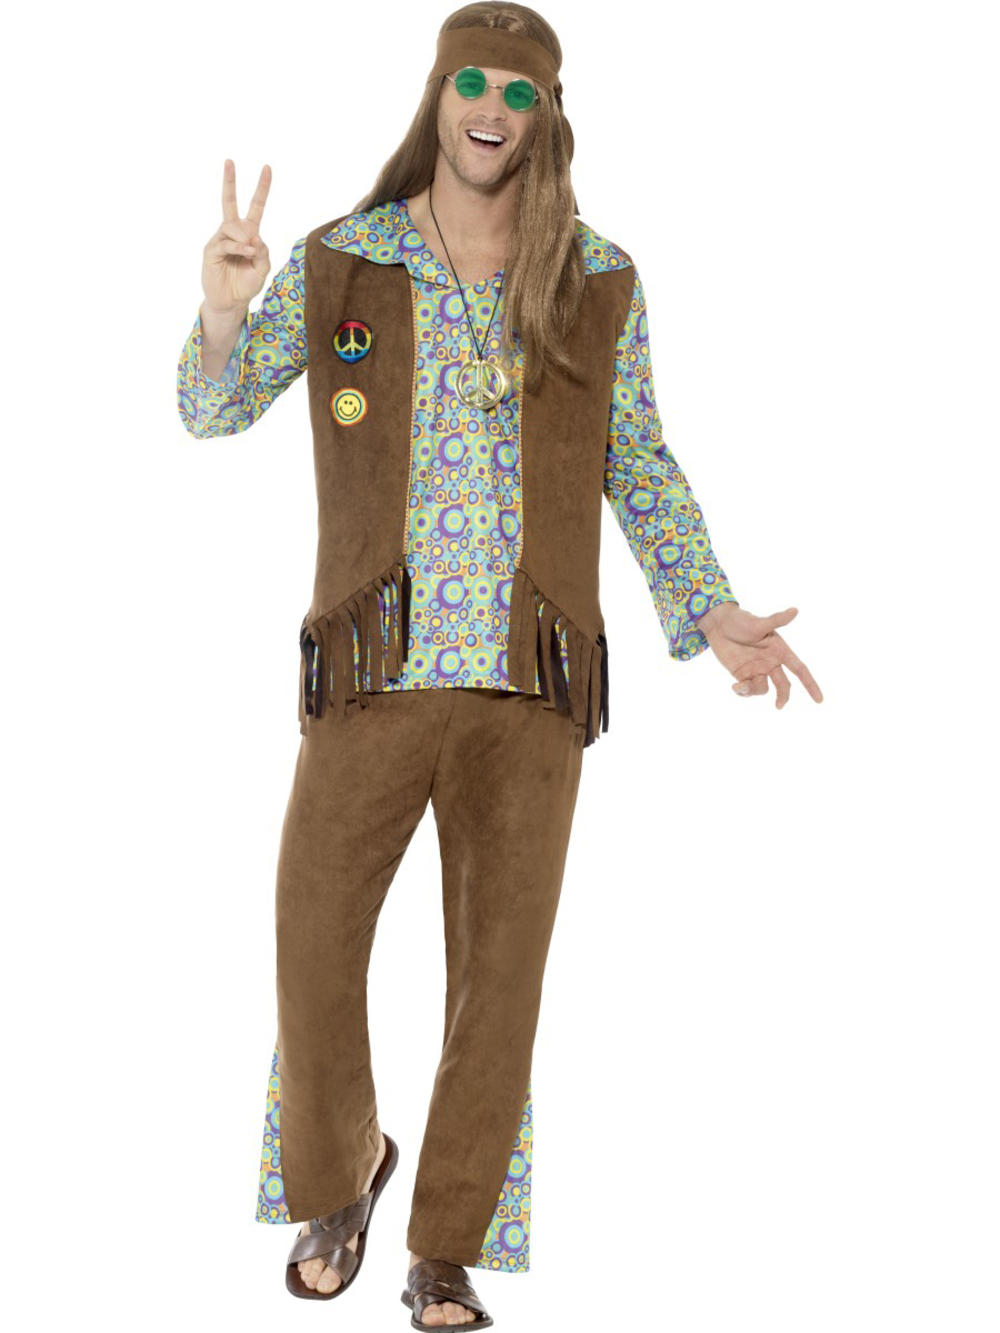 60's Hippie Mens Fancy Dress 1960s 1970s Groovy Funky Peace Hippy Adults Costume